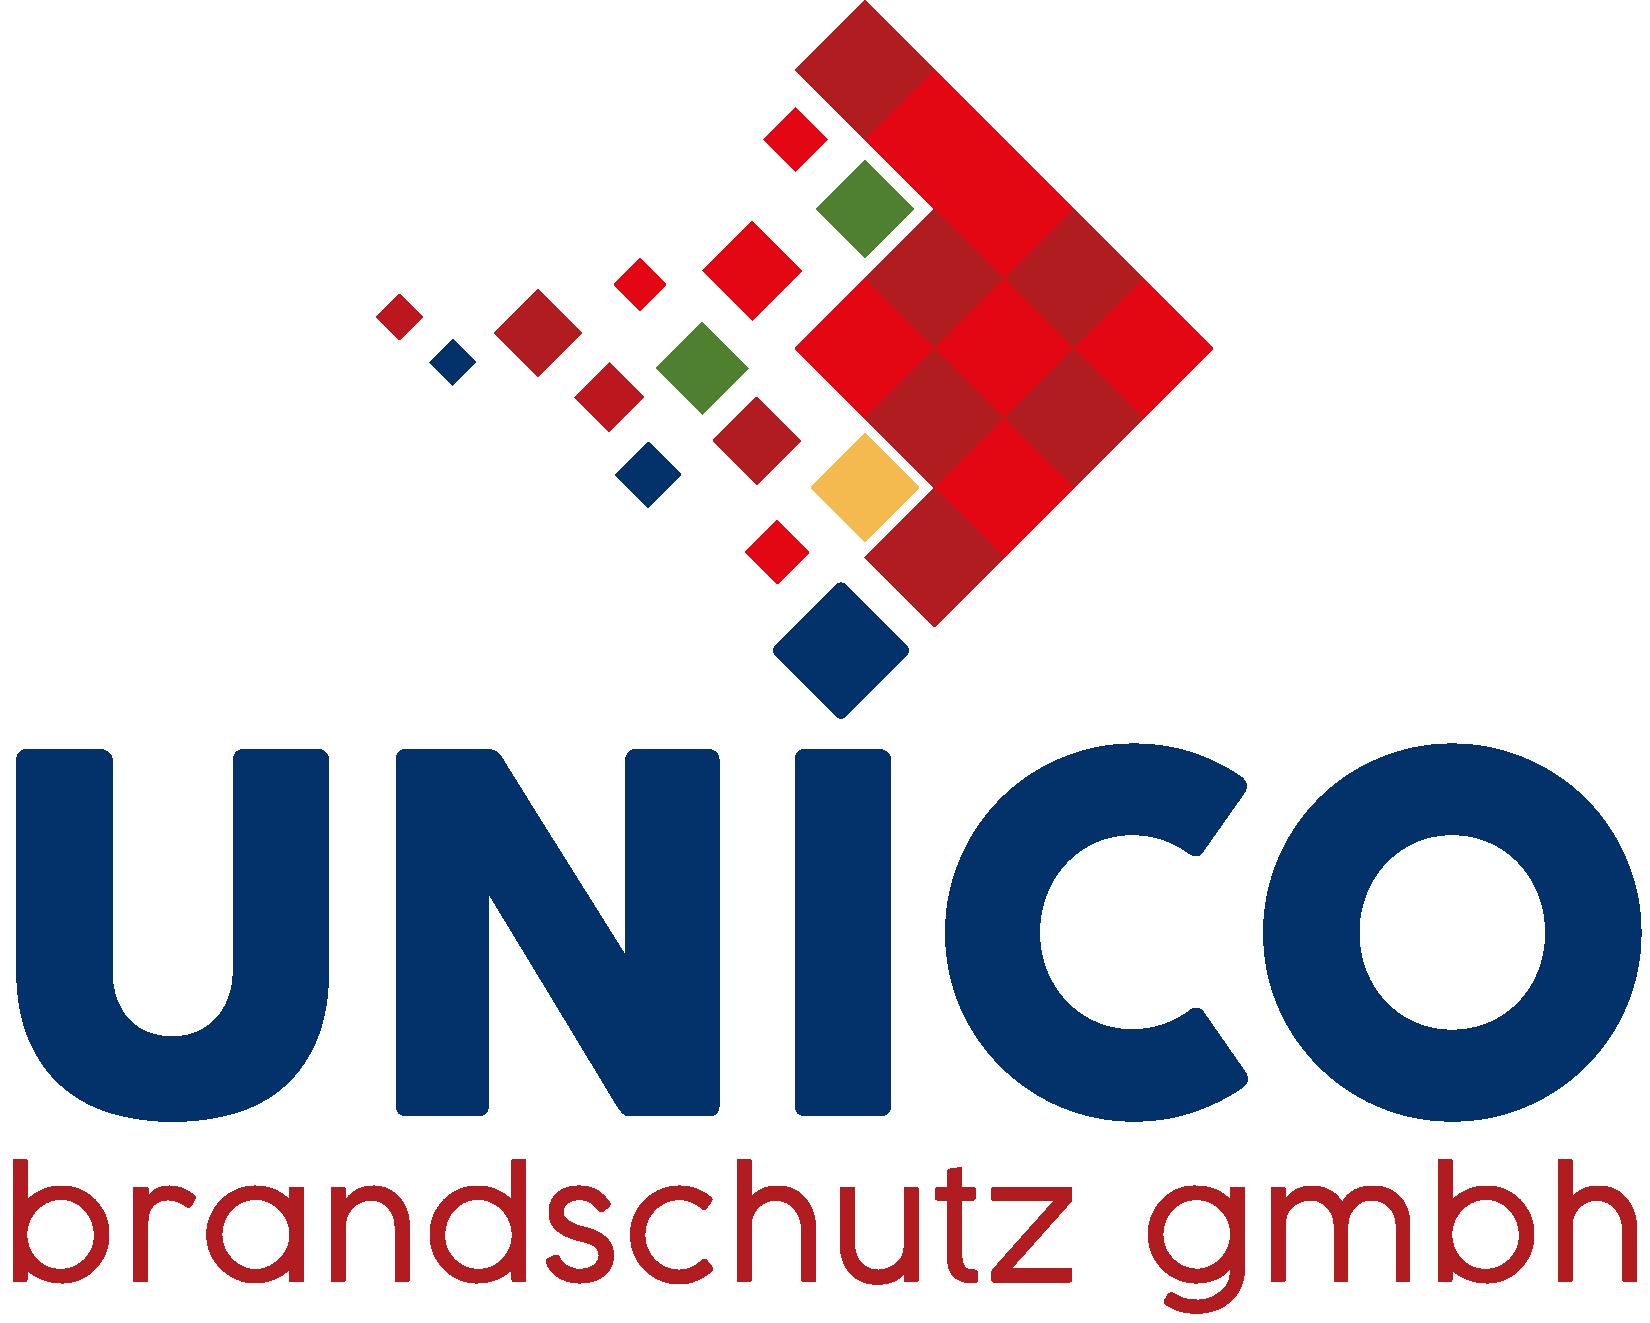 Unico brandschutz gmbh